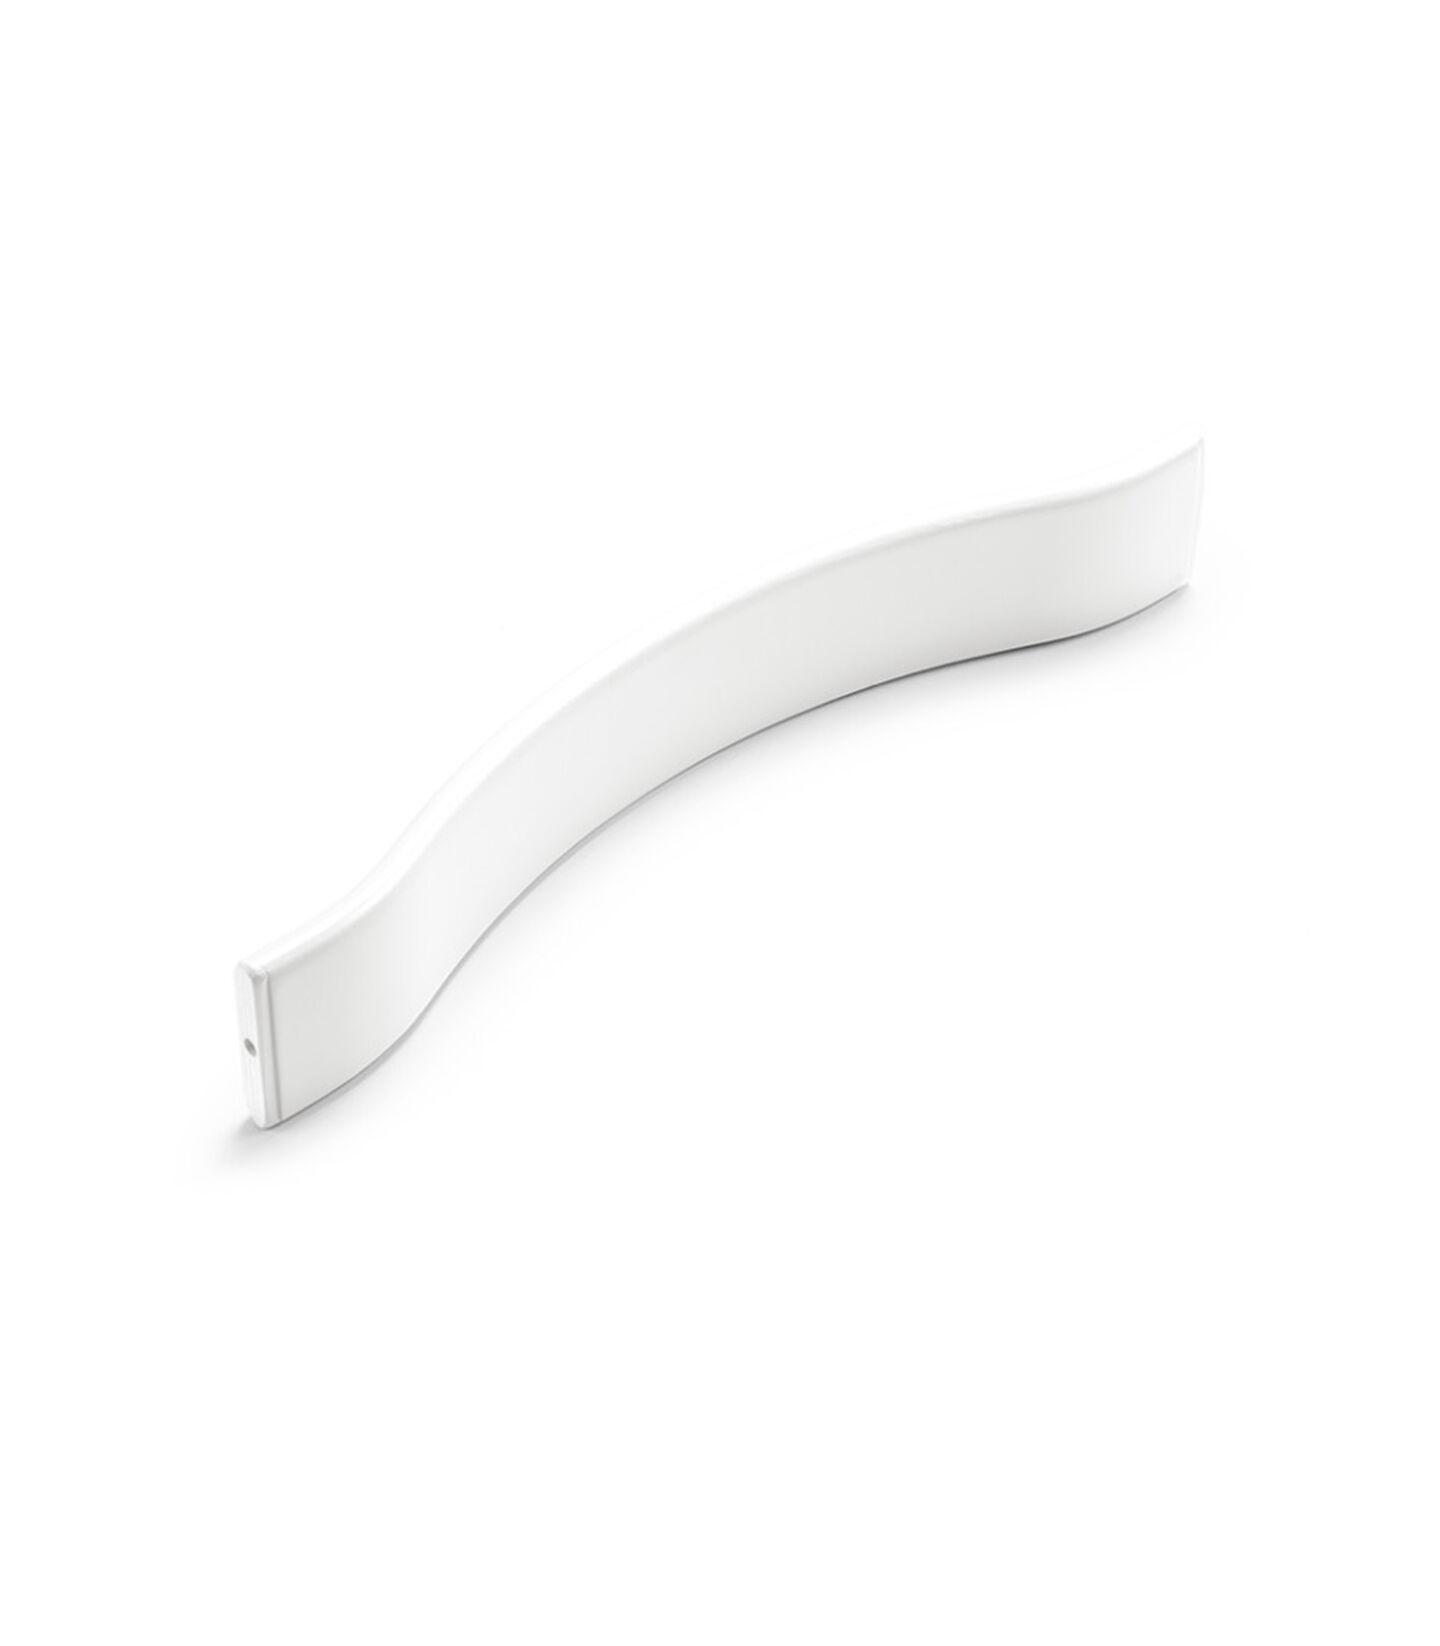 Tripp Trapp® Ryggstøtte White, White, mainview view 1